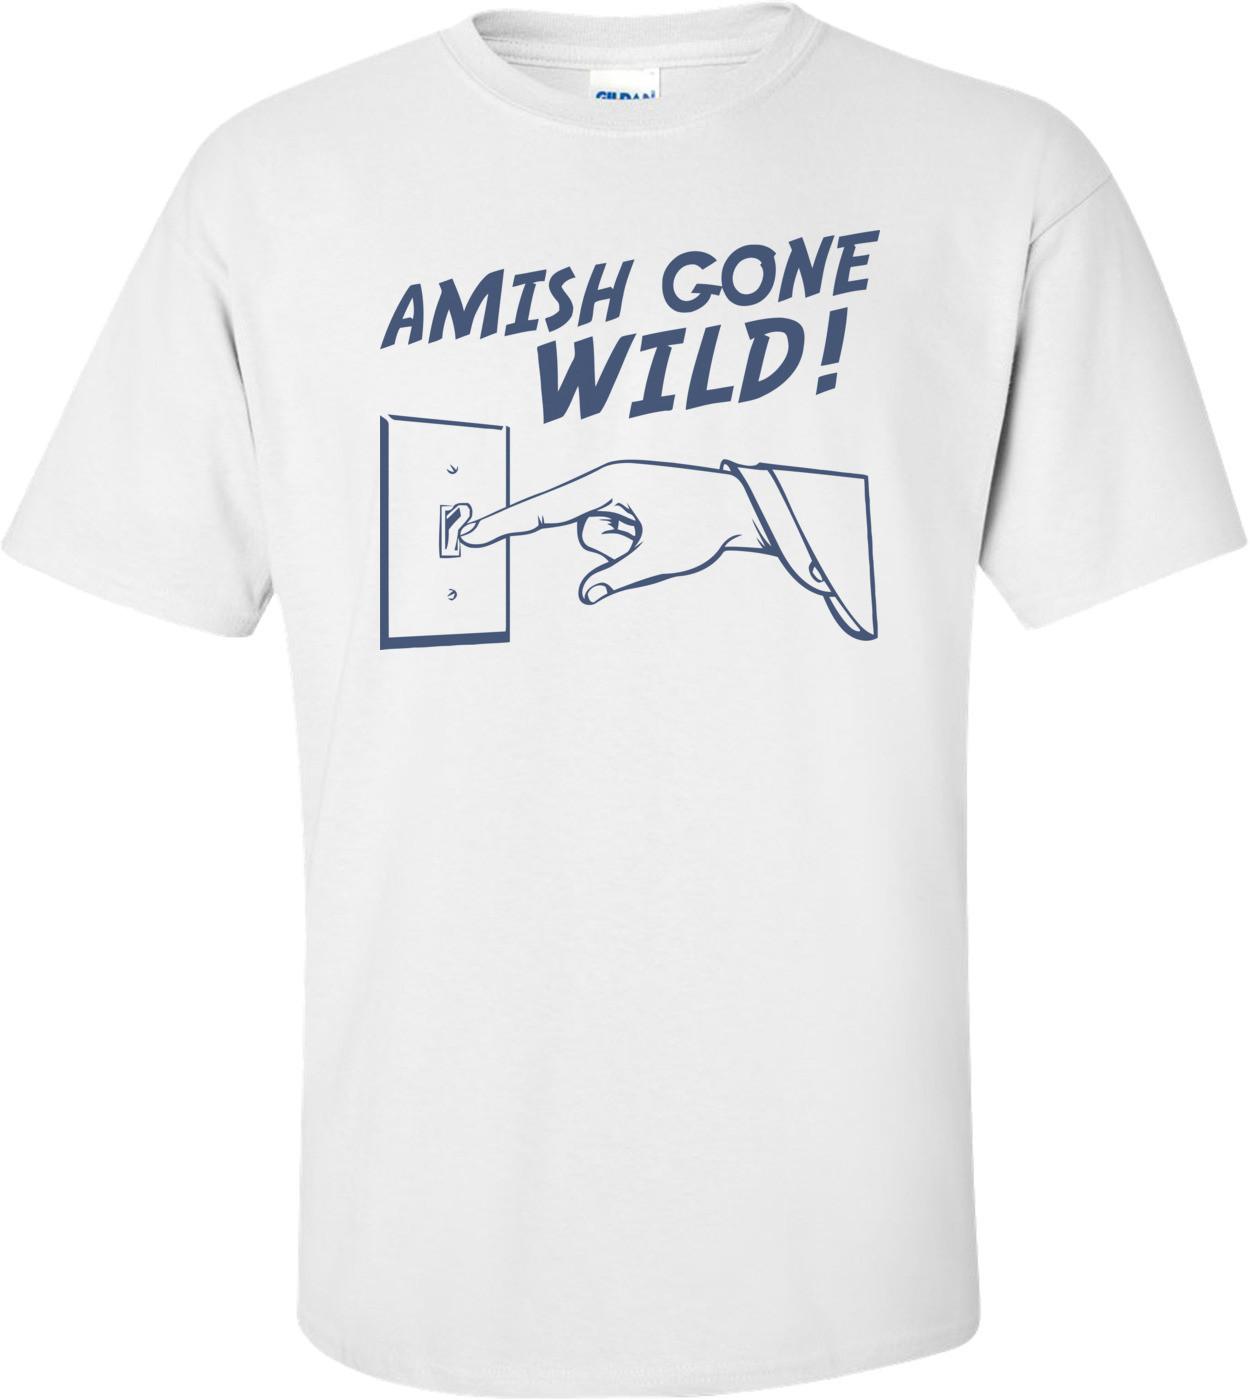 Amish Gone Wild Funny Shirt